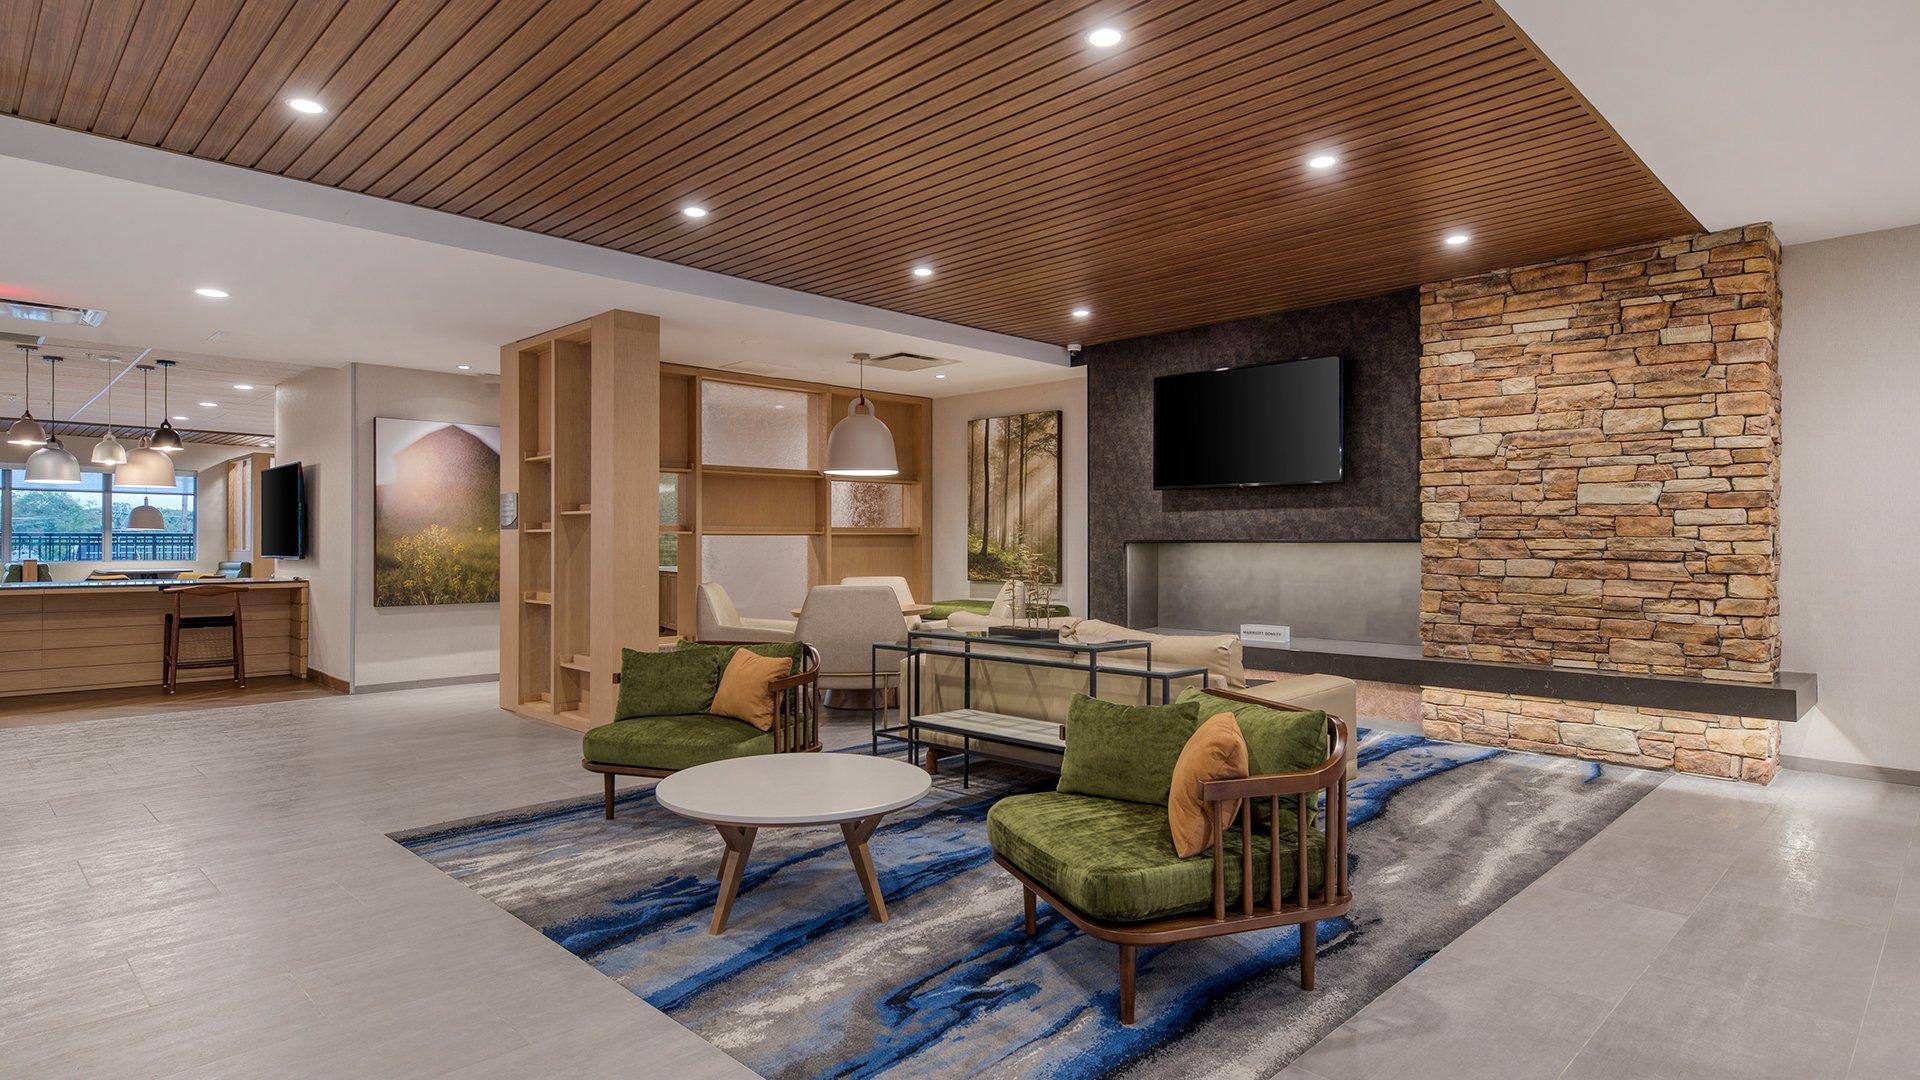 Fairfield Inn by Marriott Charlotte Belmont Lobby